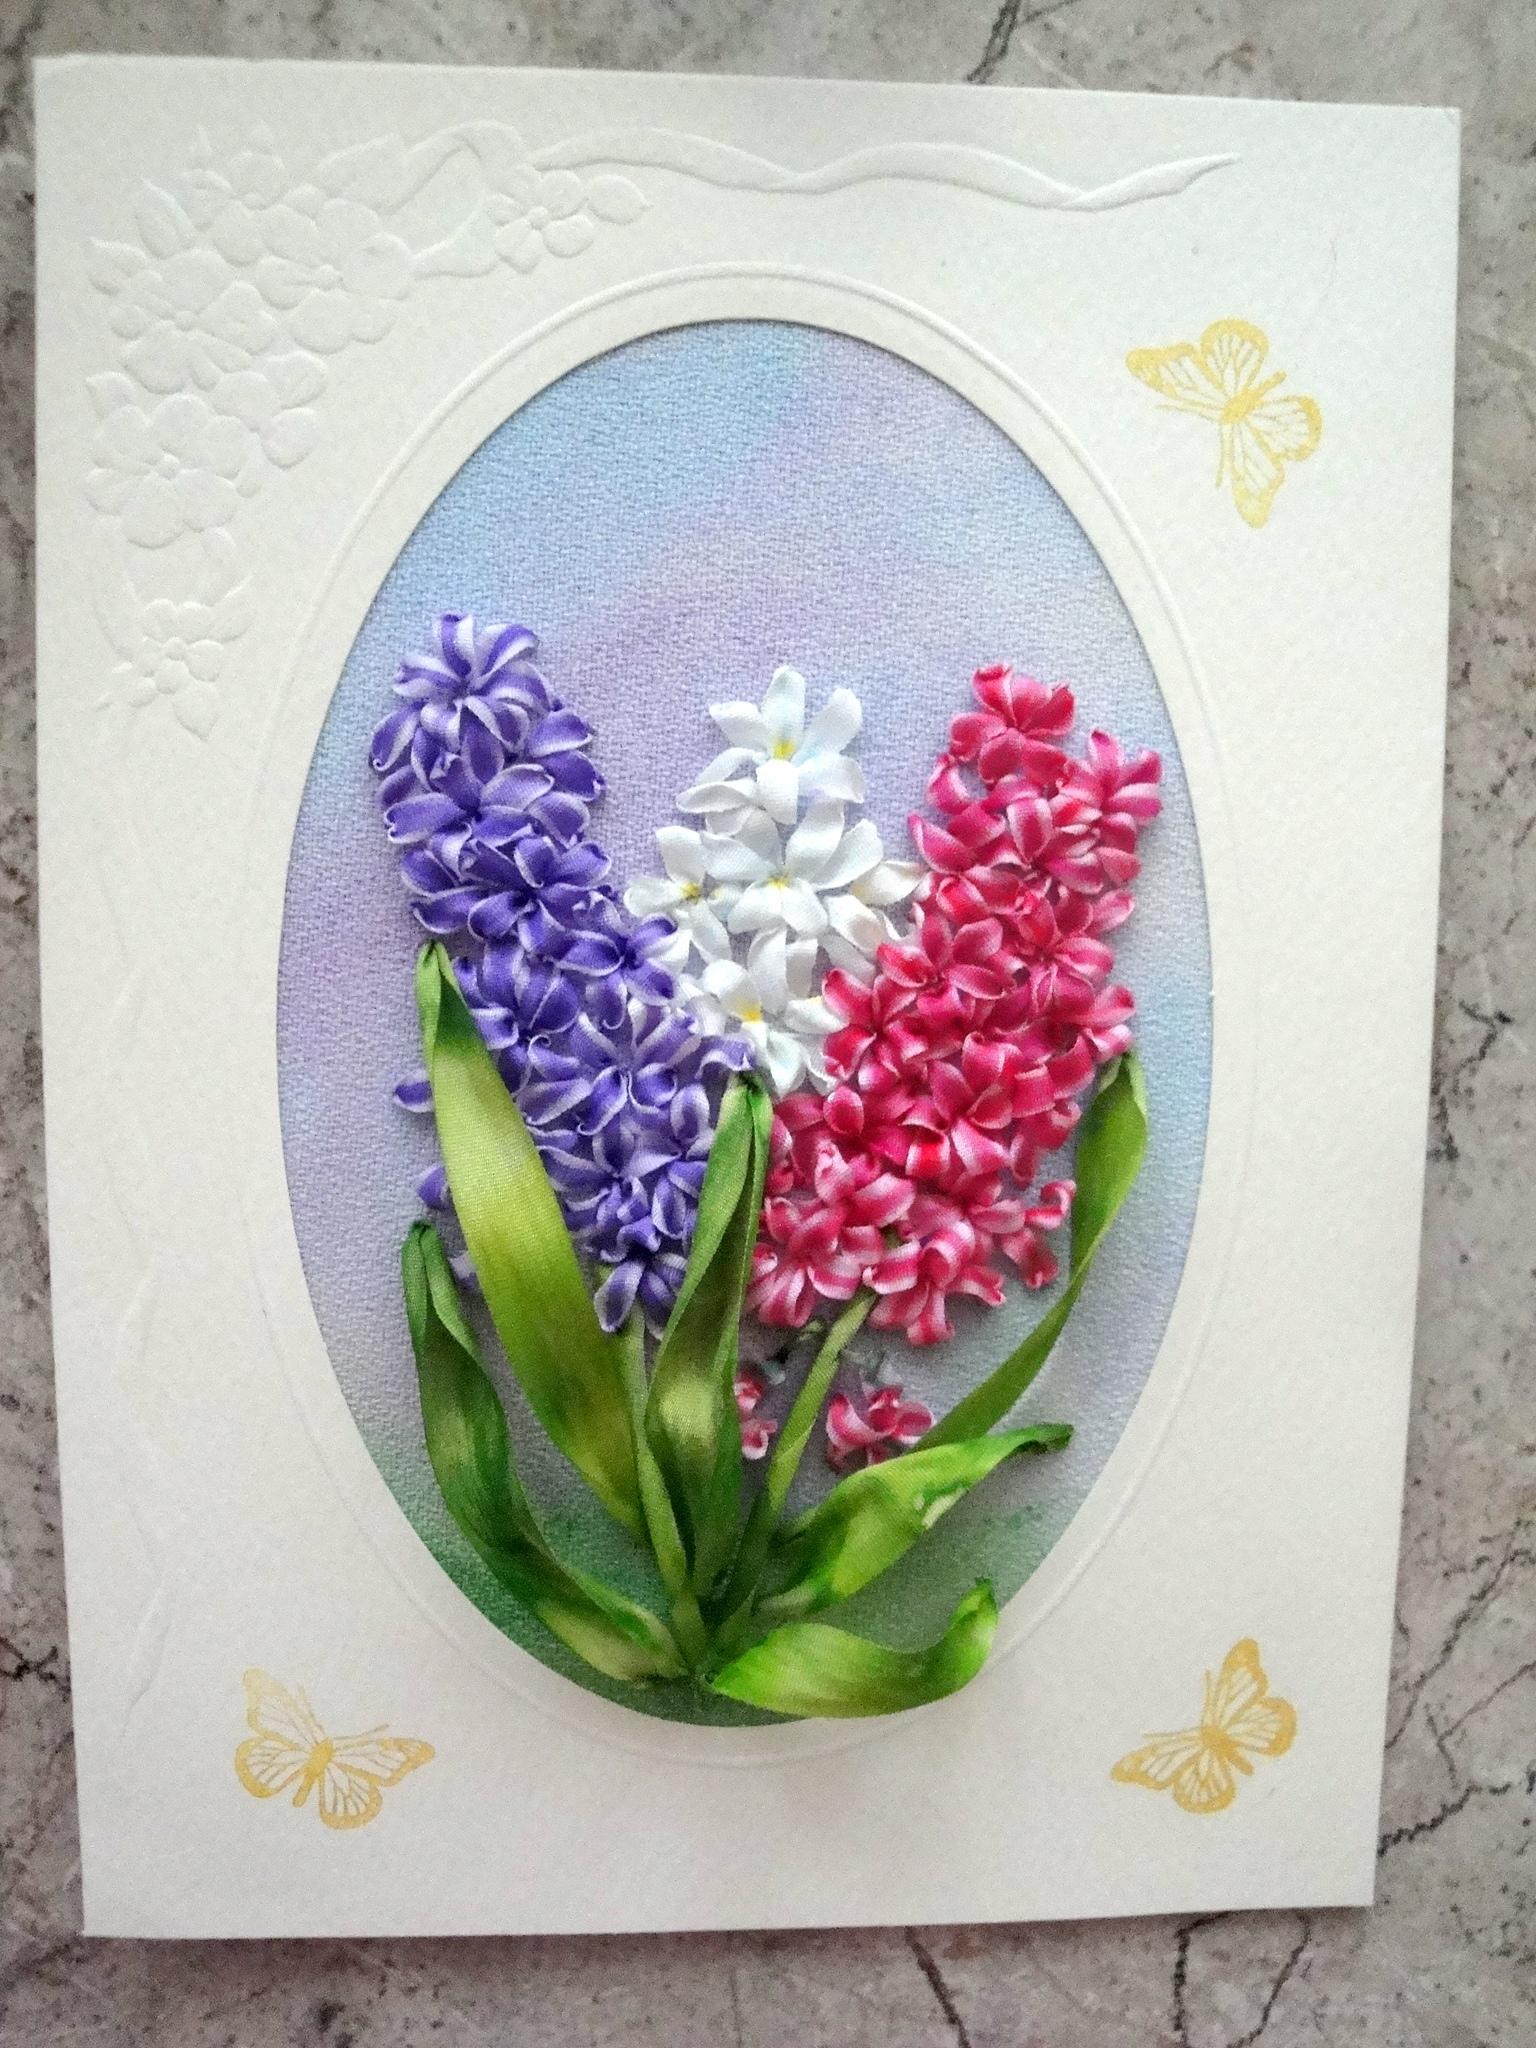 Вышивка лентами для открыток